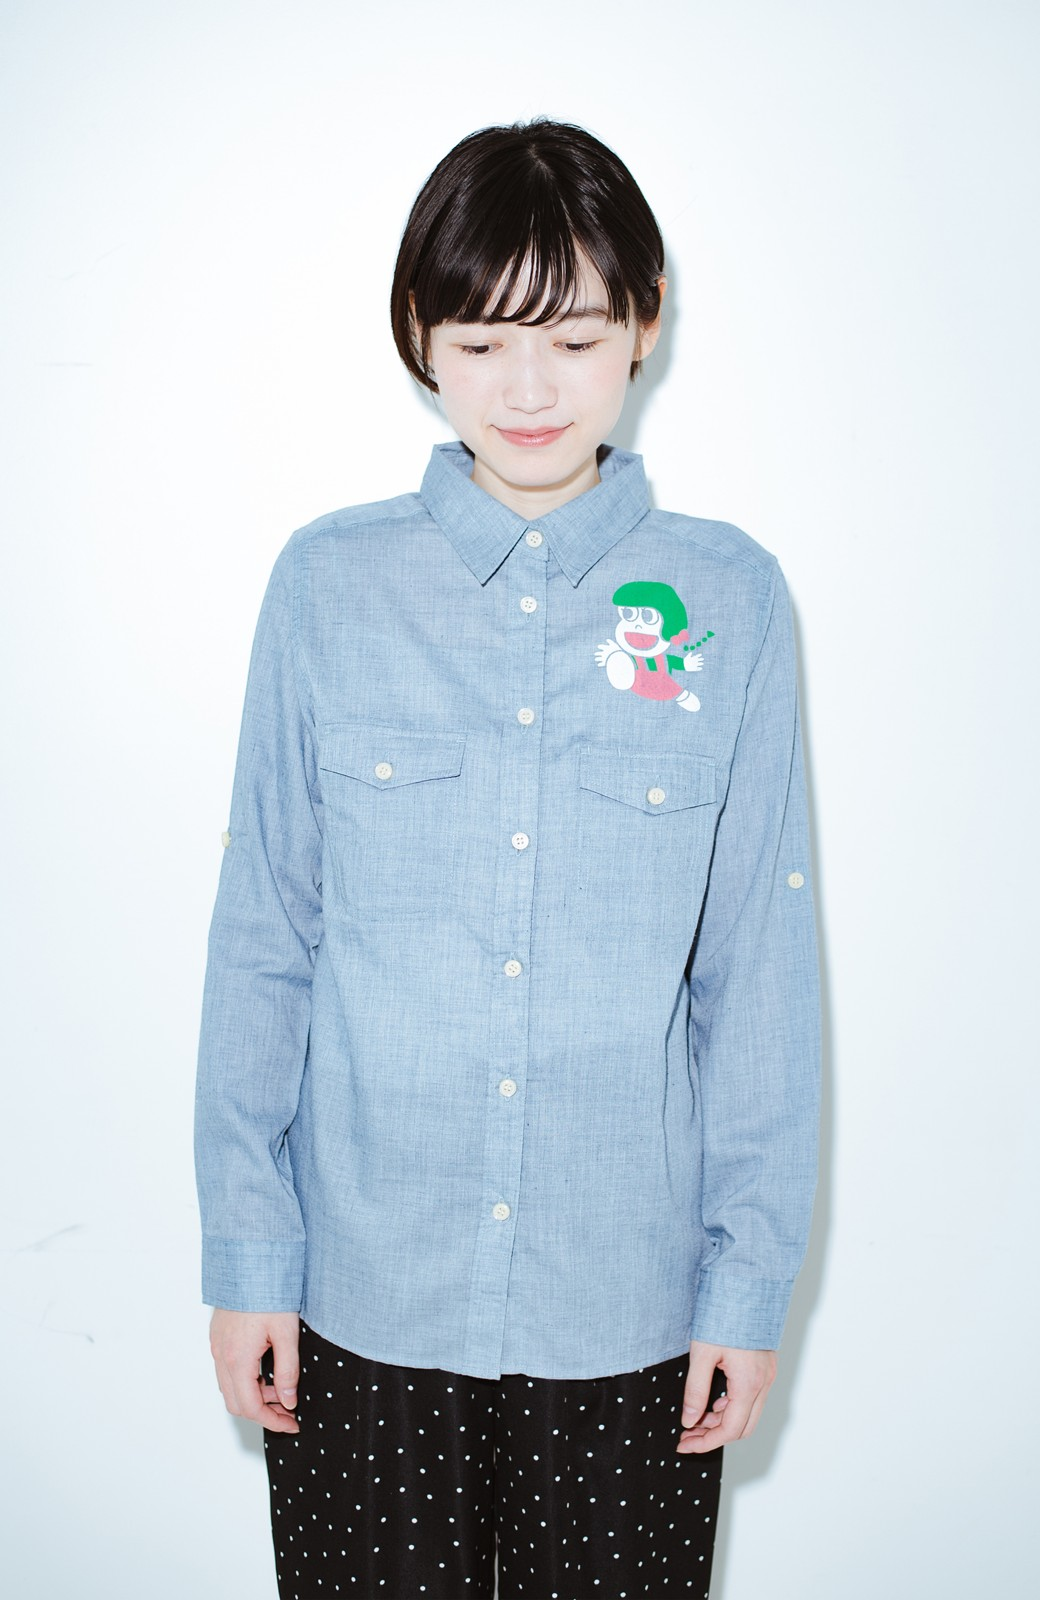 haco! co&tion JUN OSONムラ素材ワークシャツ【アーティスト監修10点もの】 <ブルー>の商品写真6